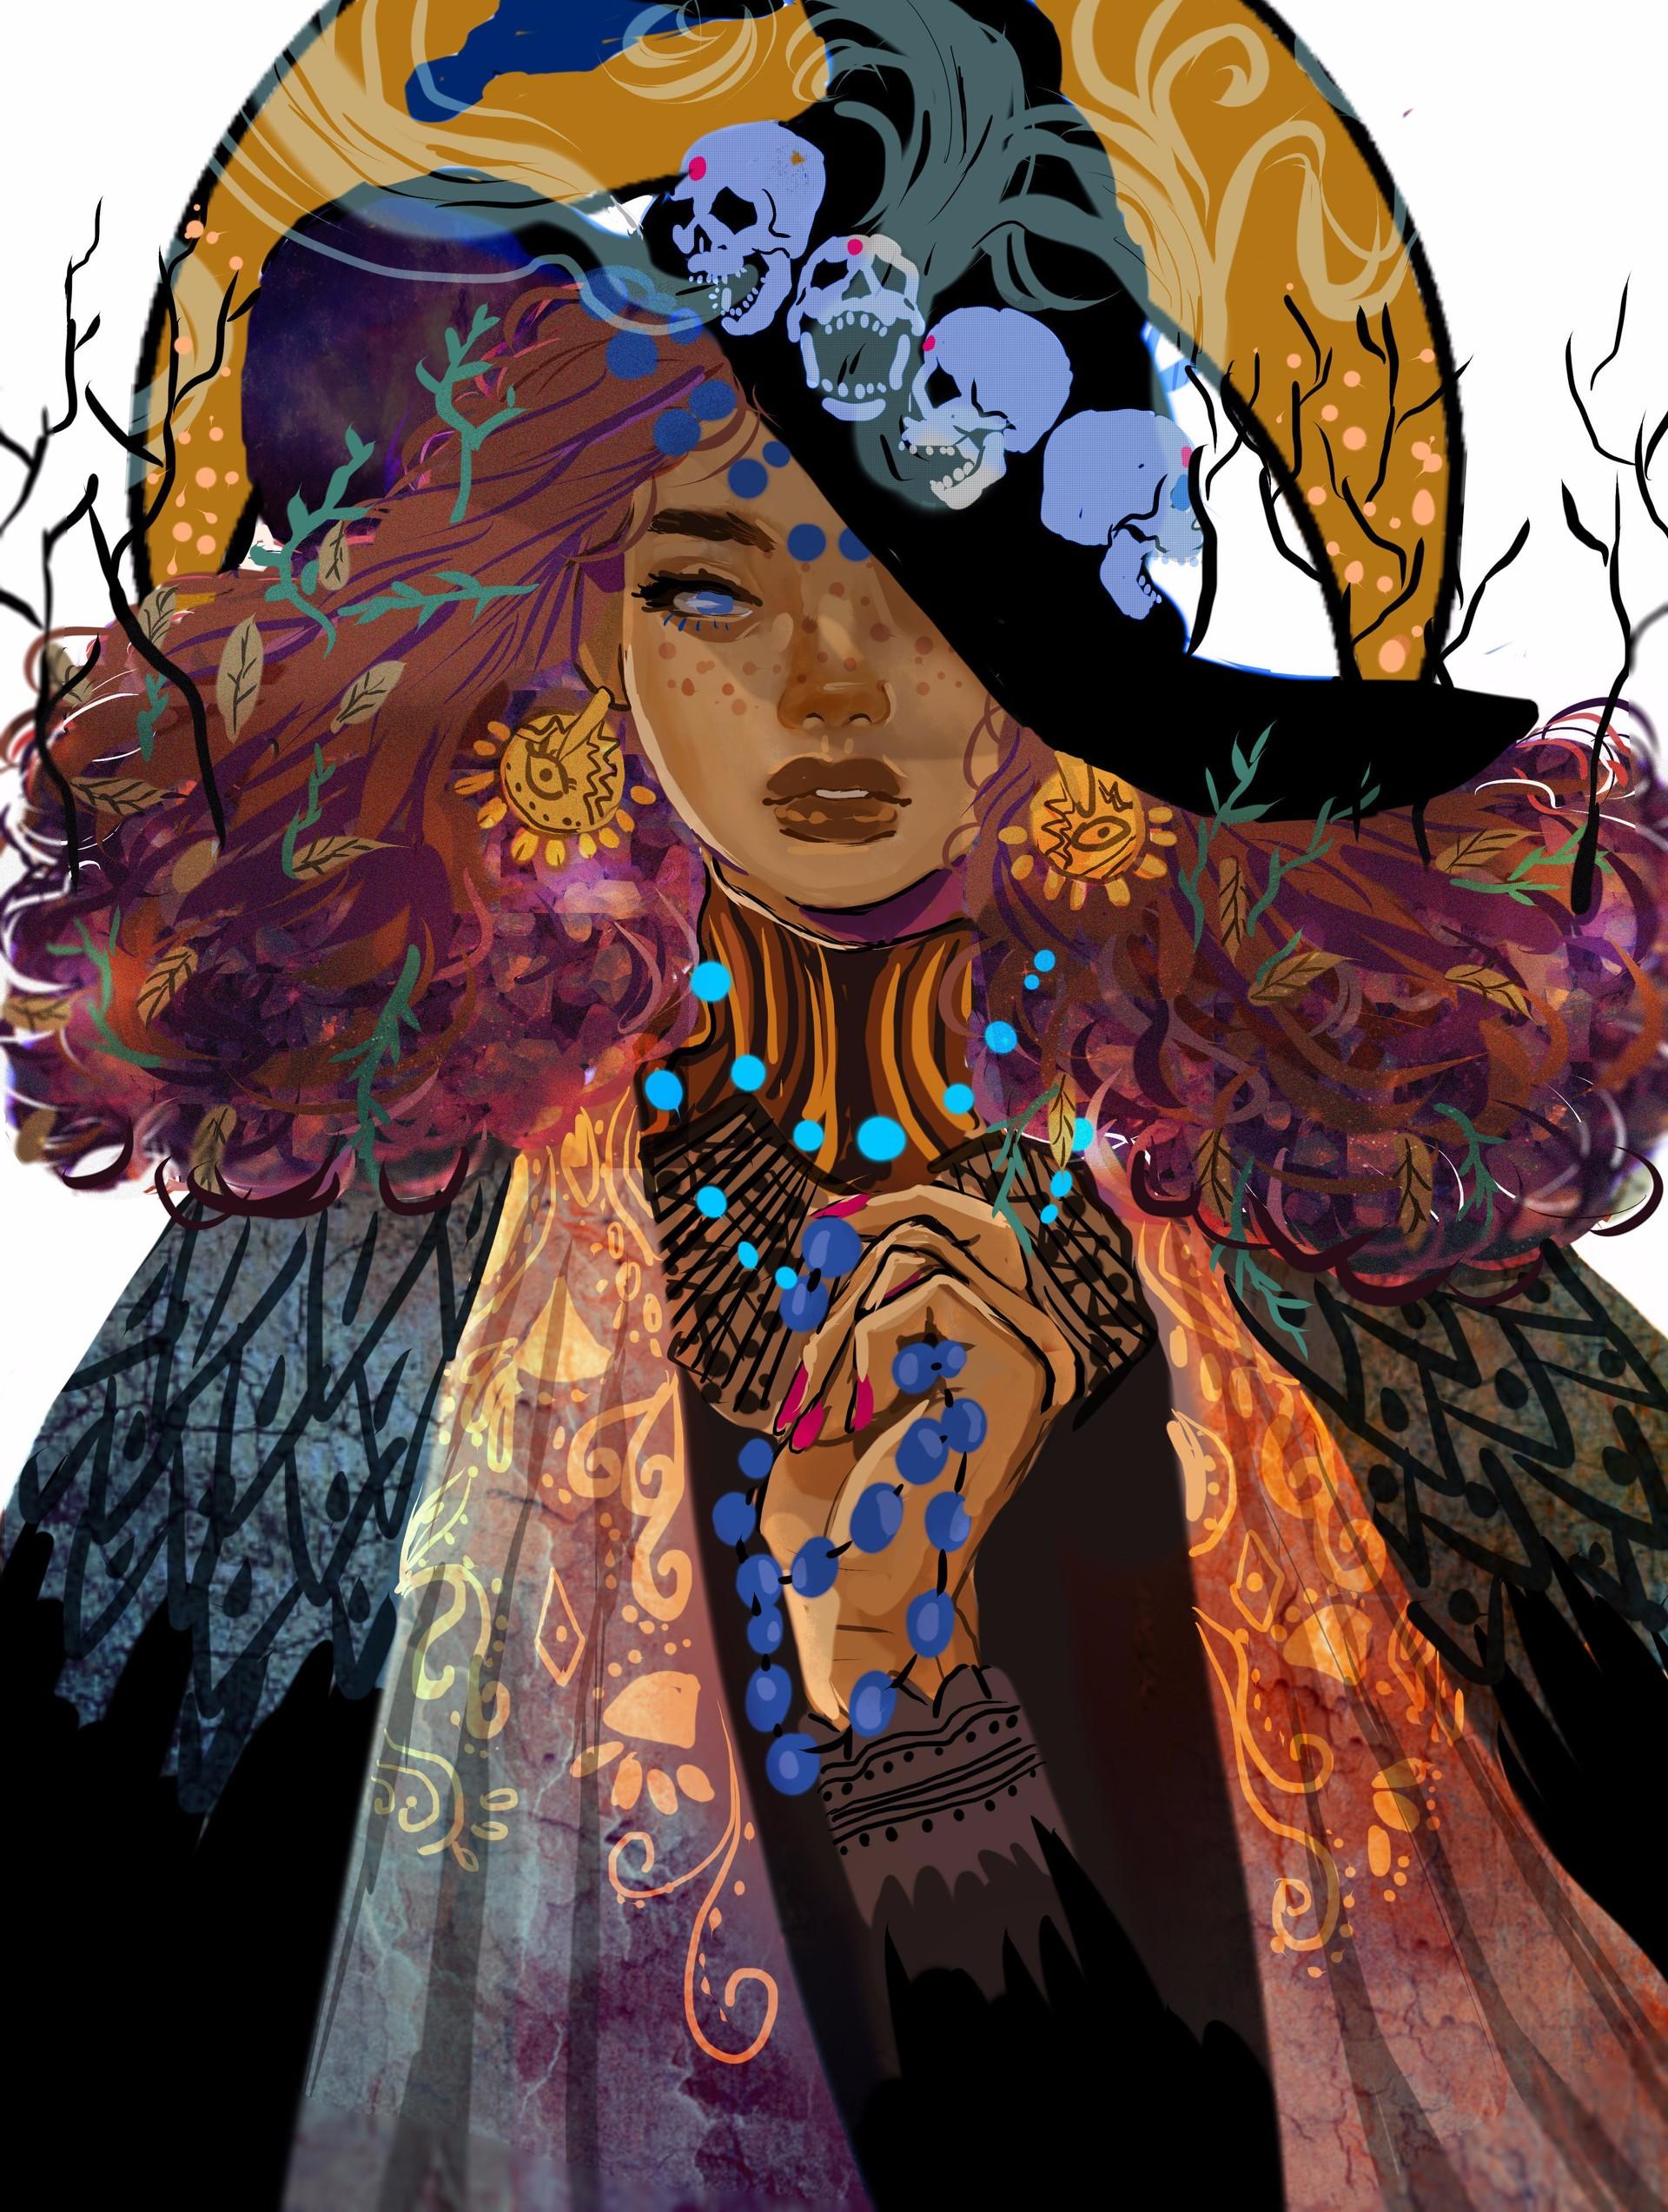 muna-abdirahman-skullwitch2.jpg